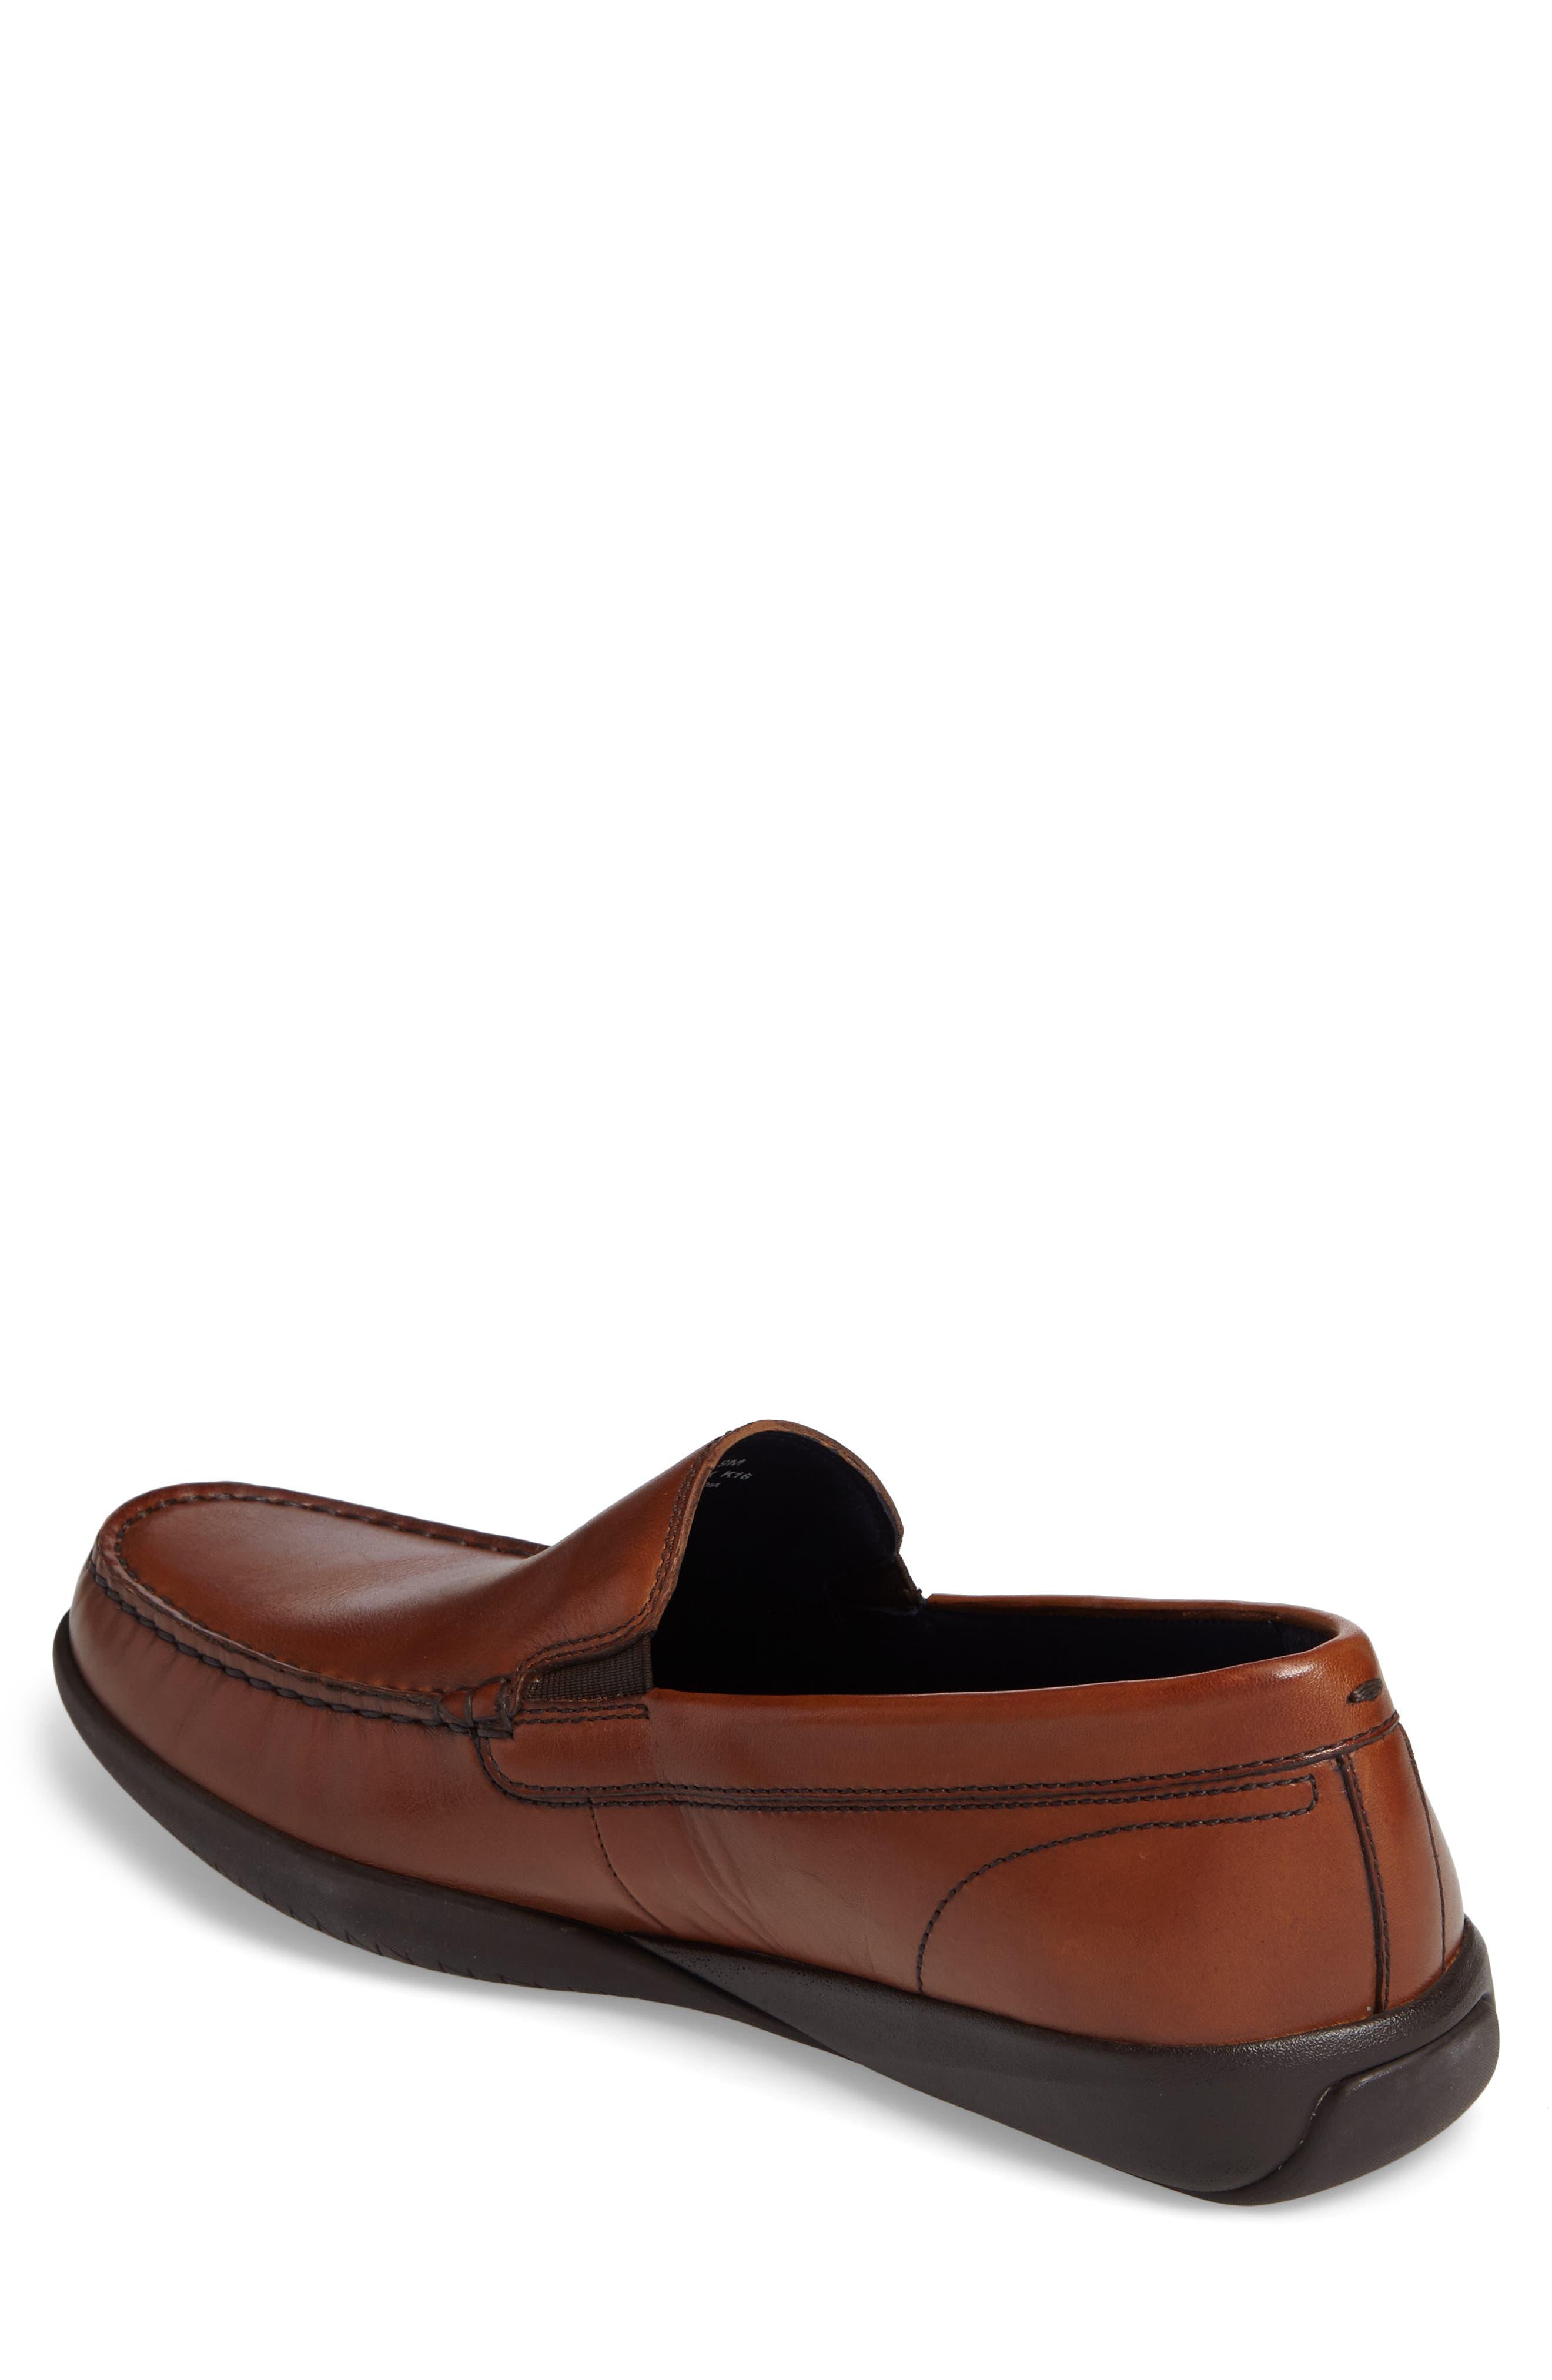 Lovell 2 Loafer,                             Alternate thumbnail 2, color,                             British Tan